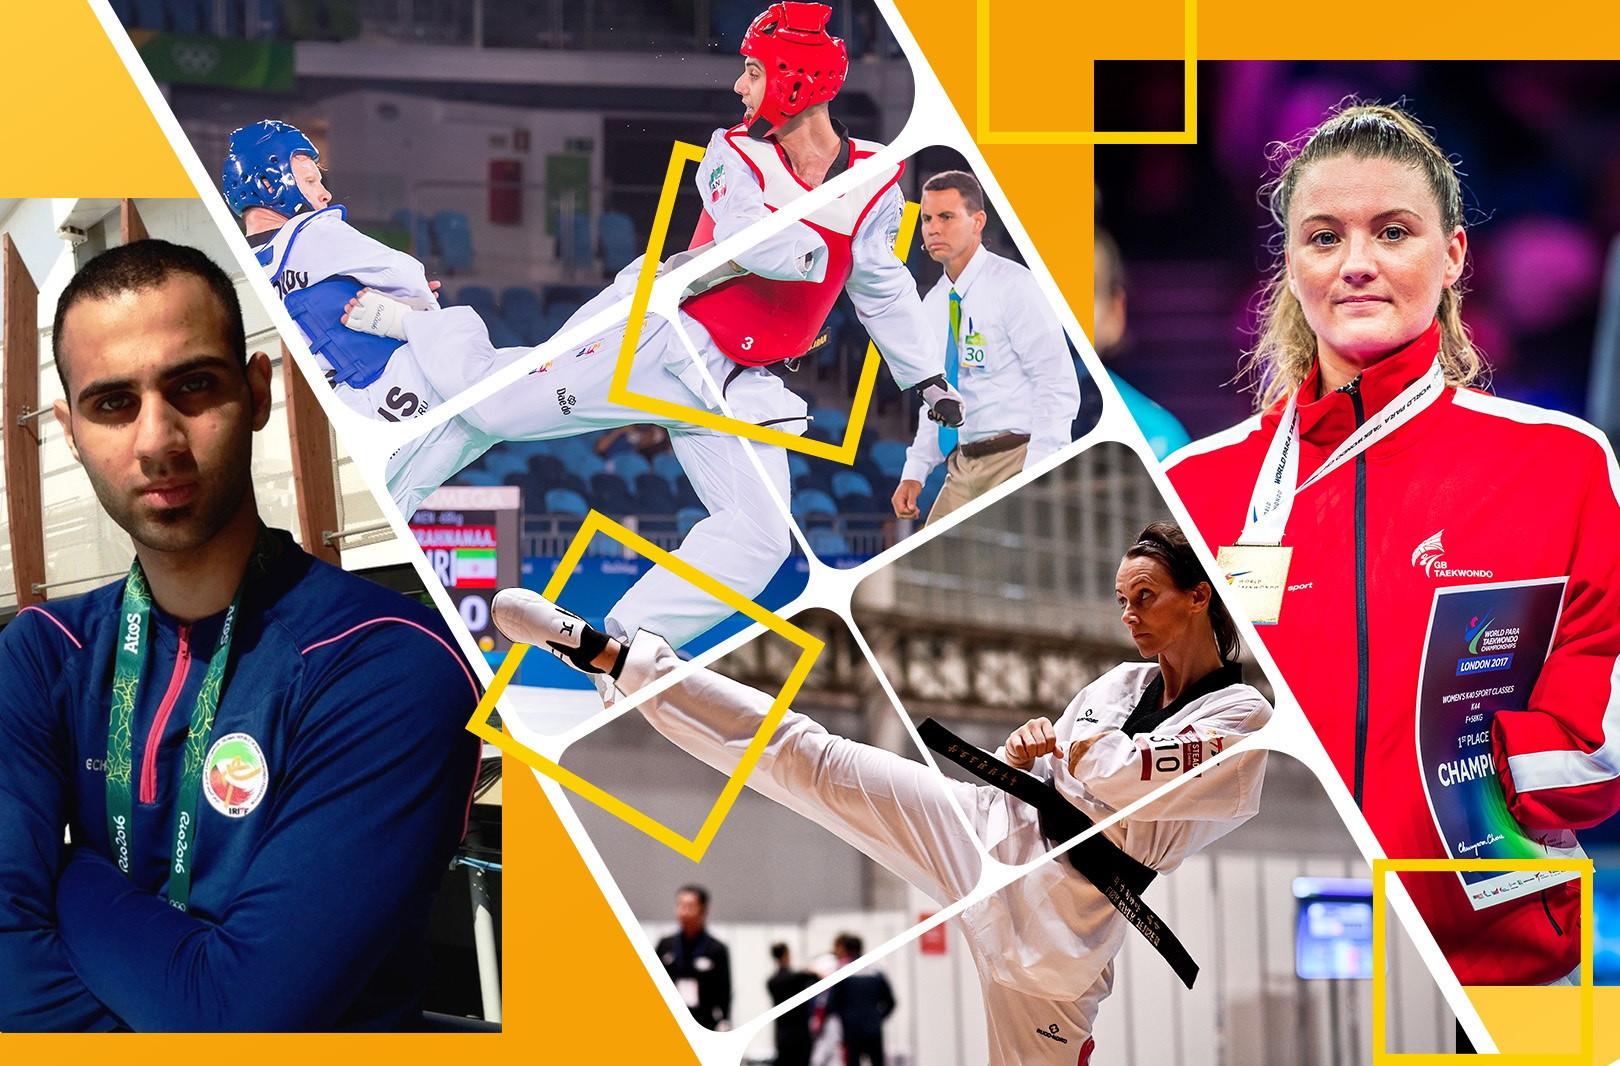 World Taekwondo toasts Para Taekwondo Day ahead of Tokyo 2020 debut